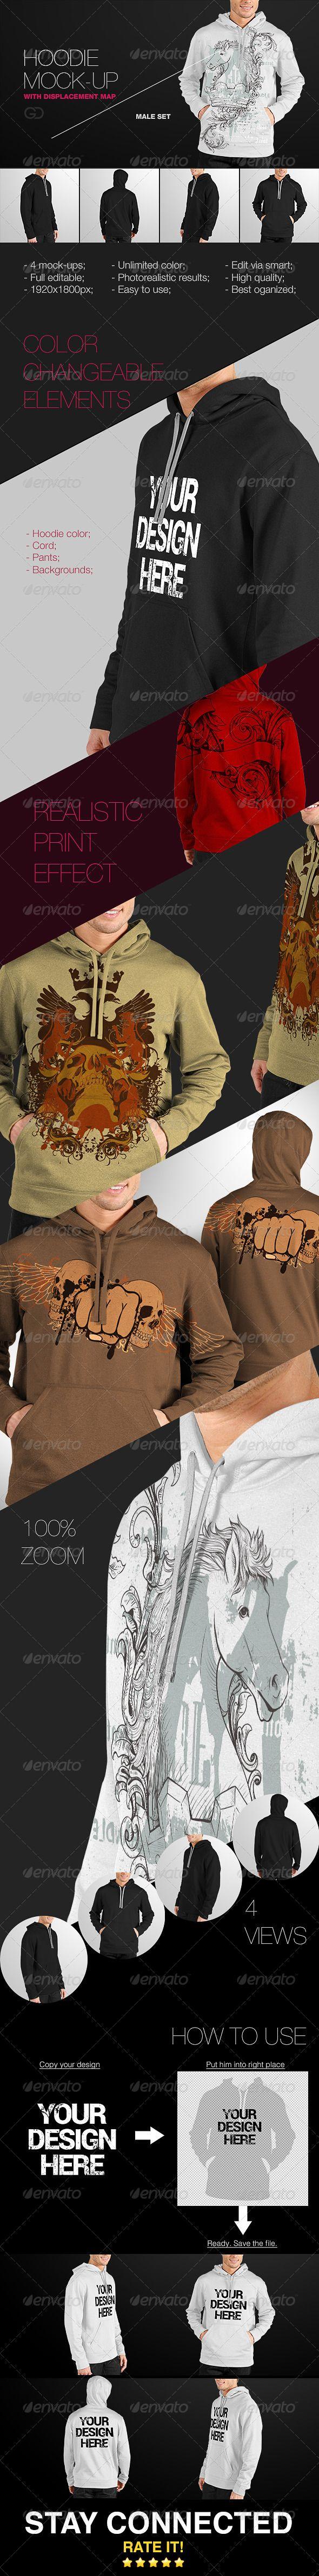 Download Hoodie Mock Up Hoodie Mockup Graphic Design Templates Clothing Mockup